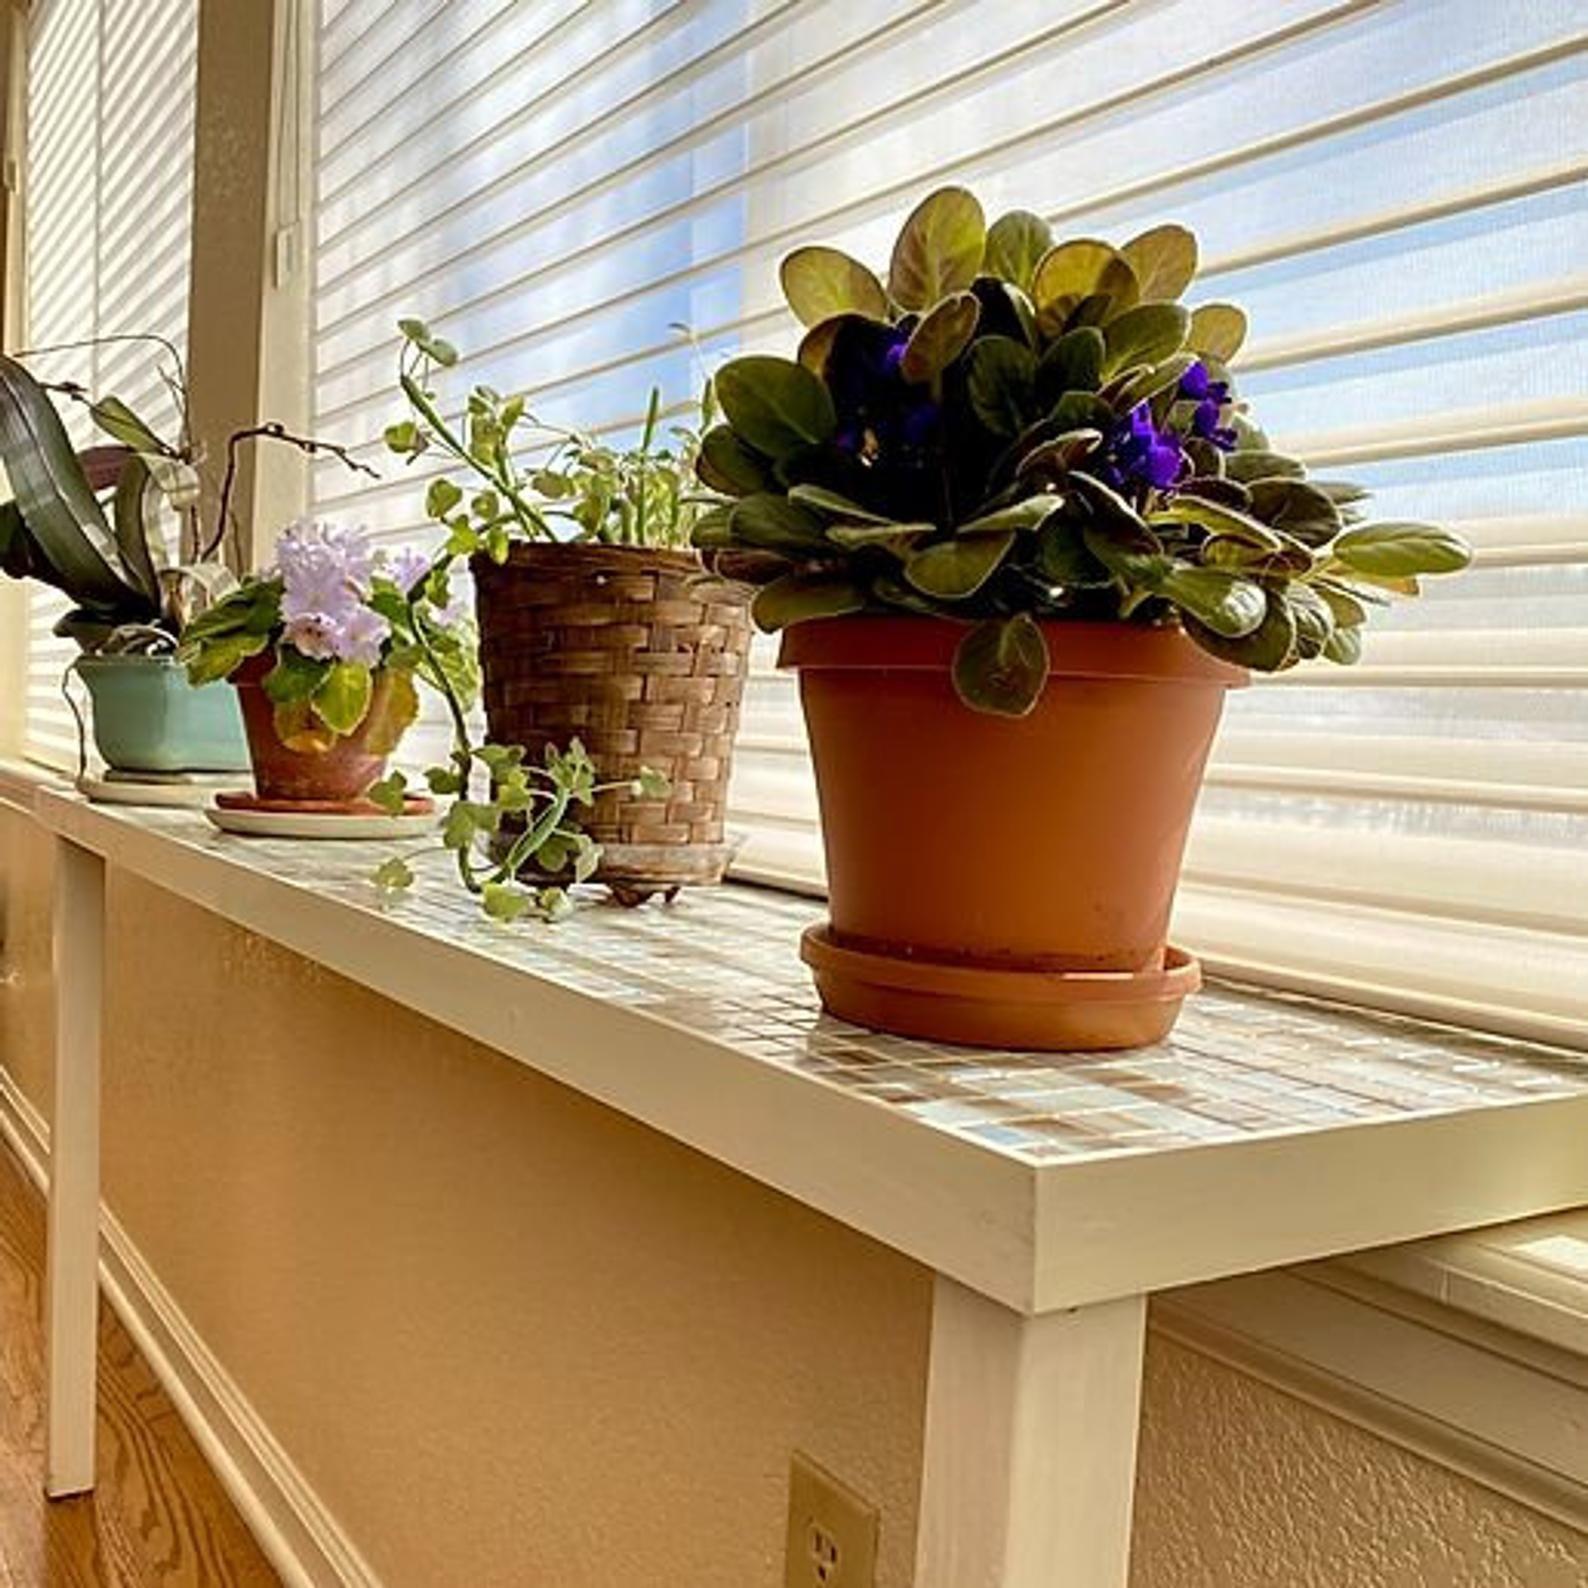 Window Sill Plant Table Plant Table Window Sill Window Plants